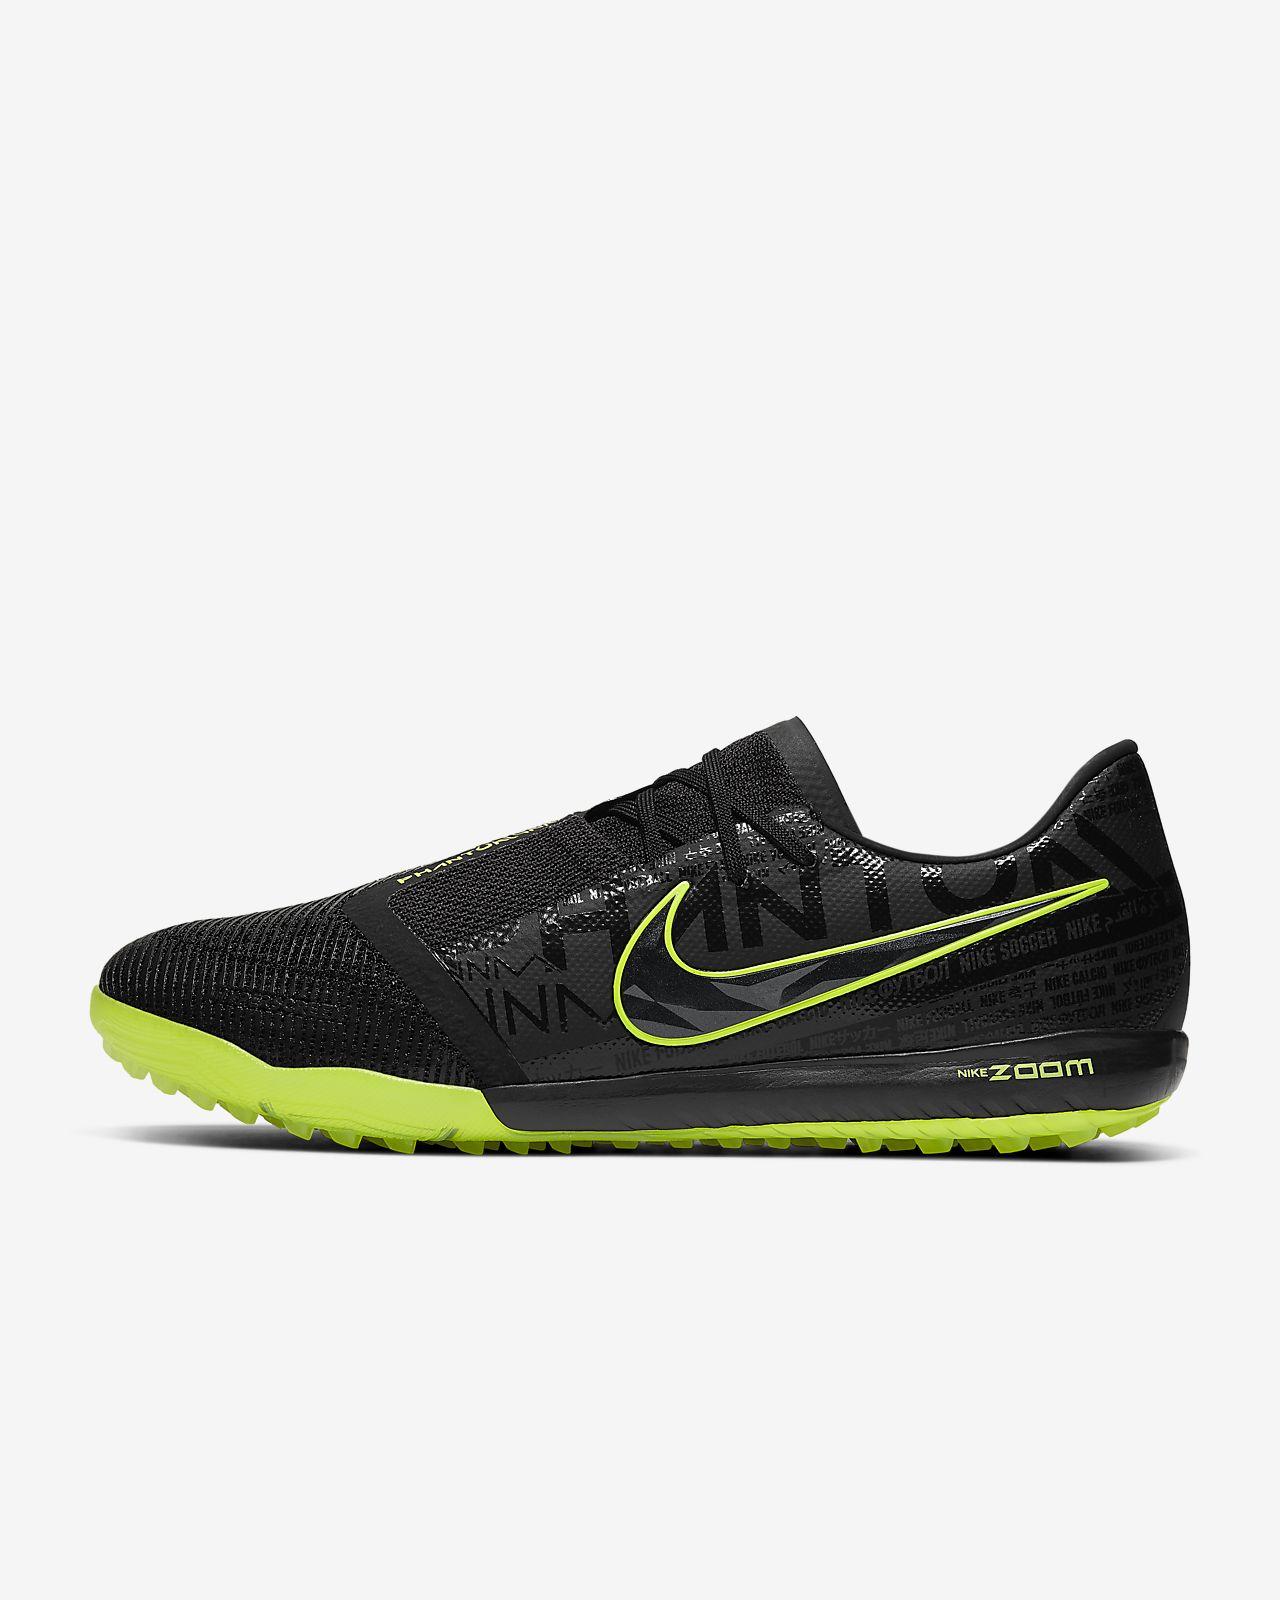 Fotbollssko för grus/turf Nike Zoom Phantom Venom Pro TF